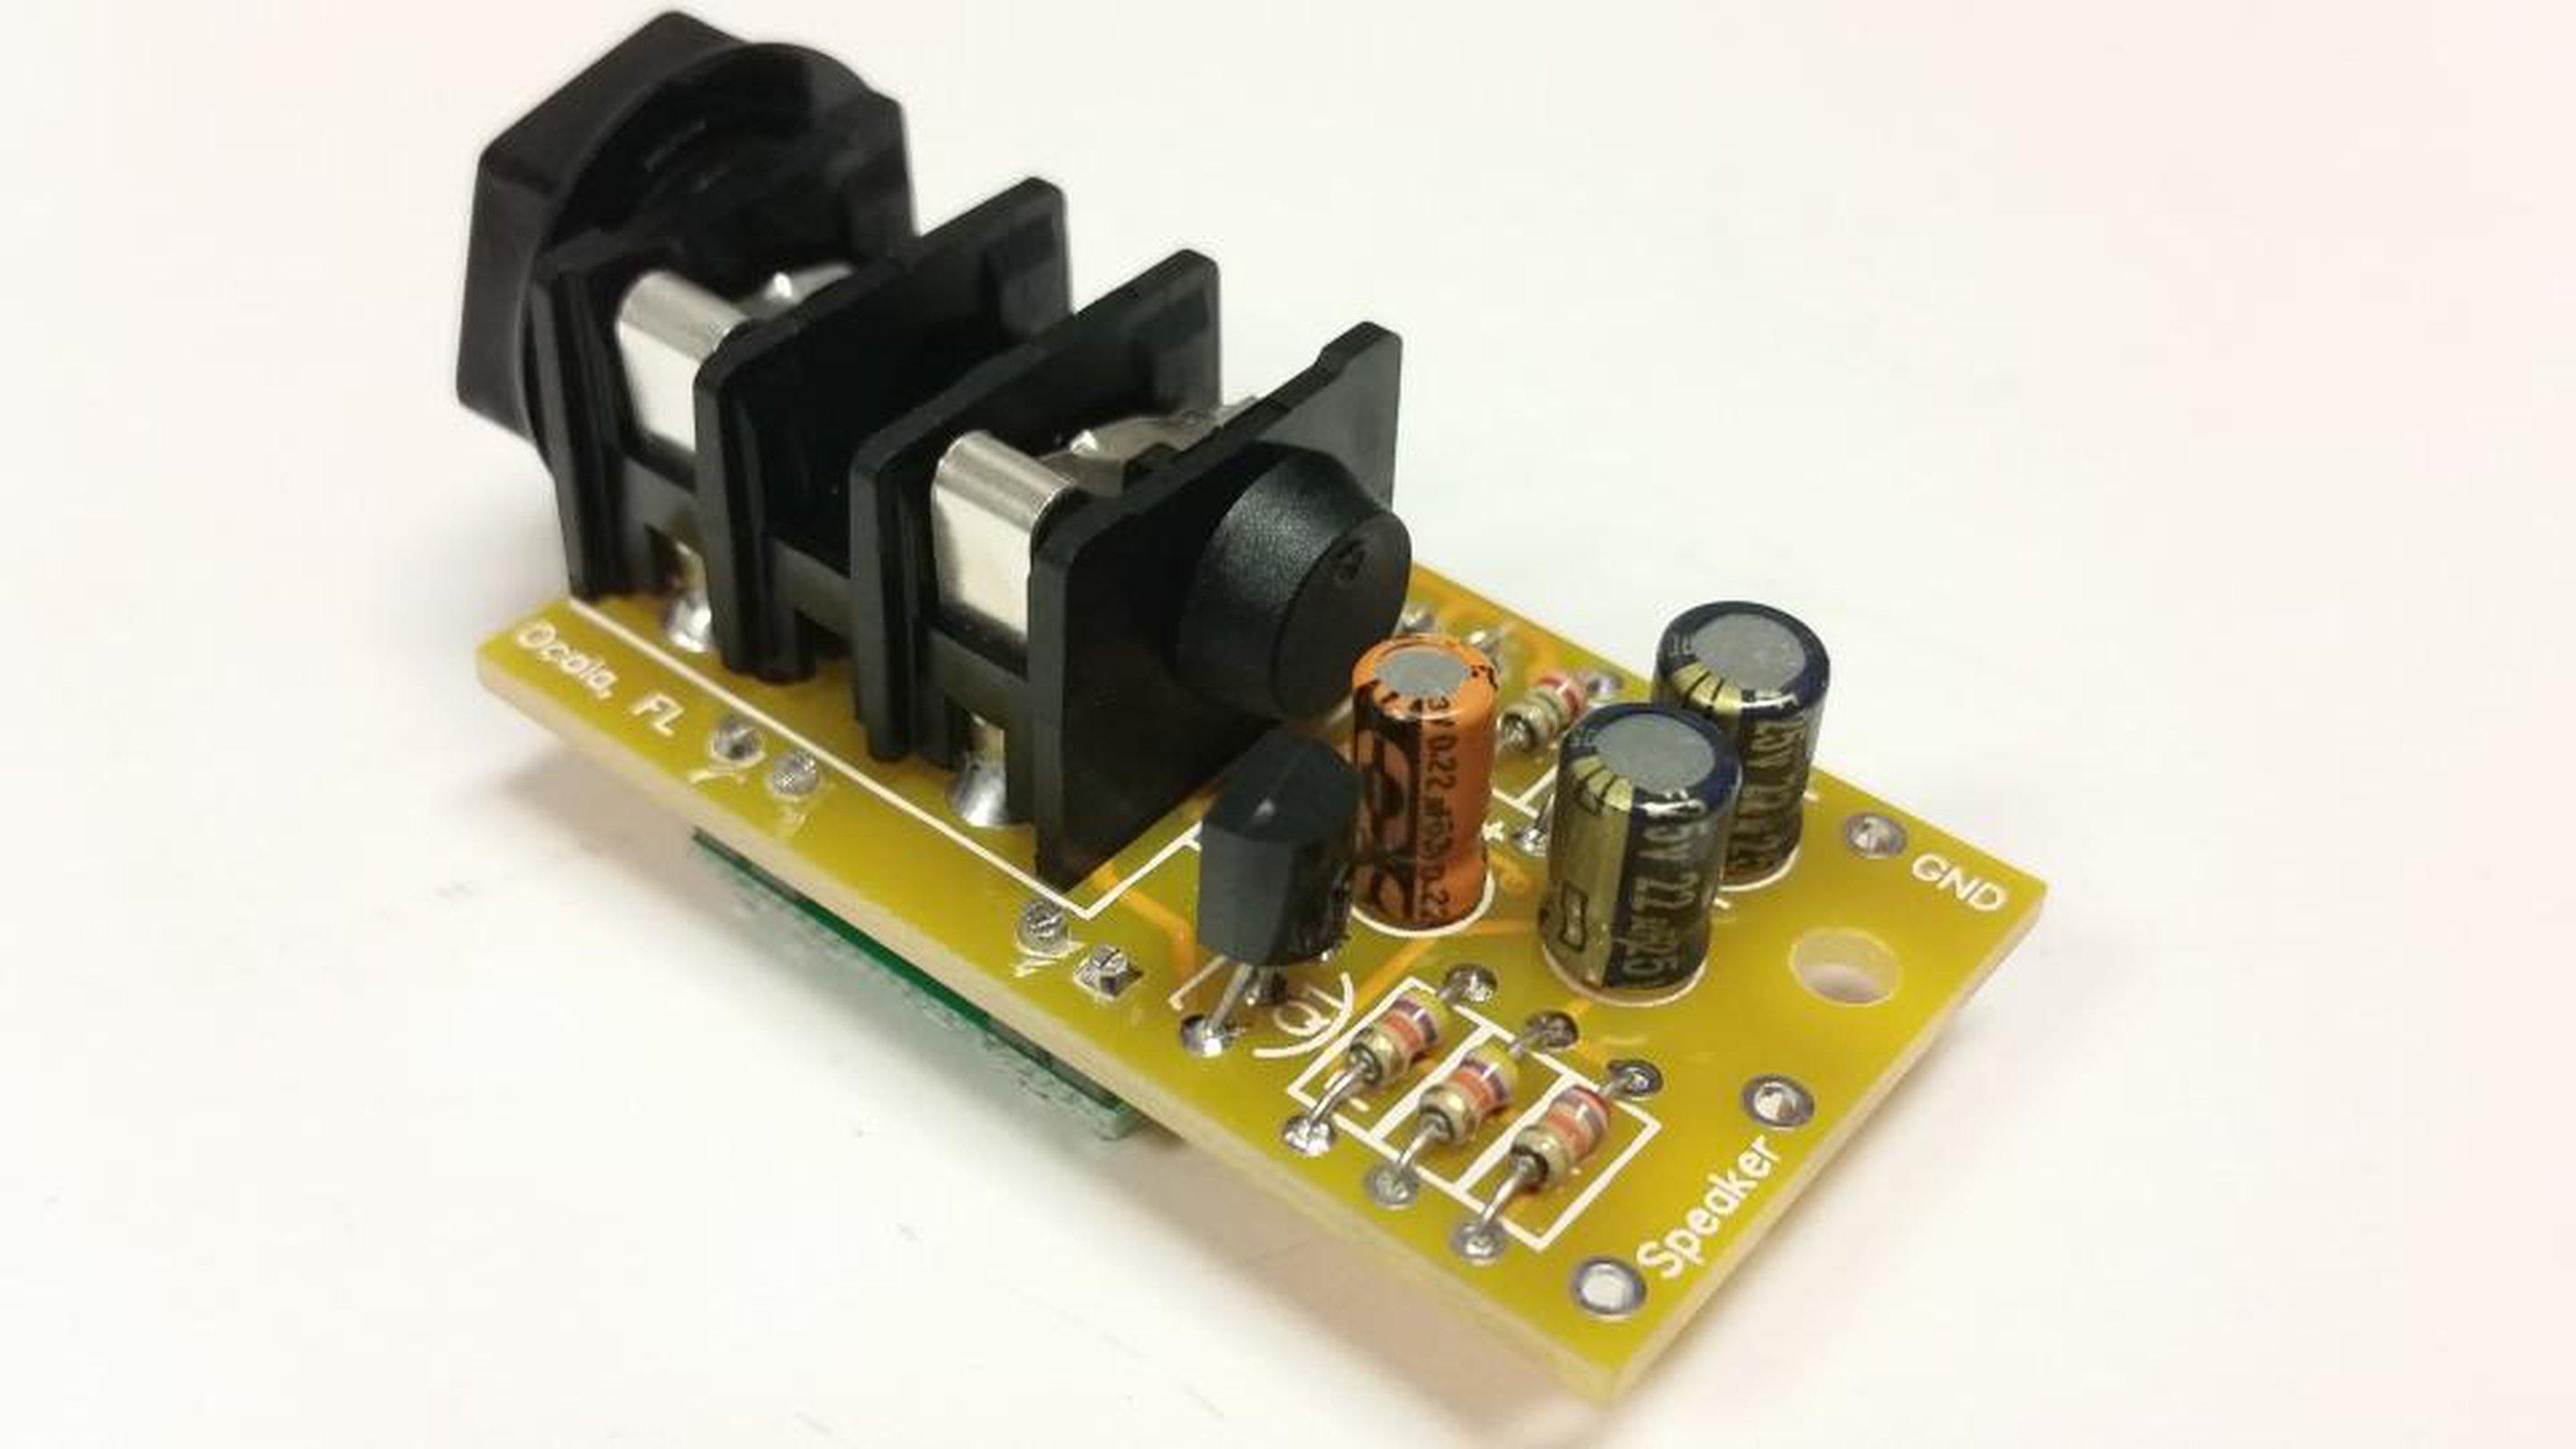 Electronic Equipment Supplies Amp Services : Watt micro guitar amp kit from nightfire electronics llc